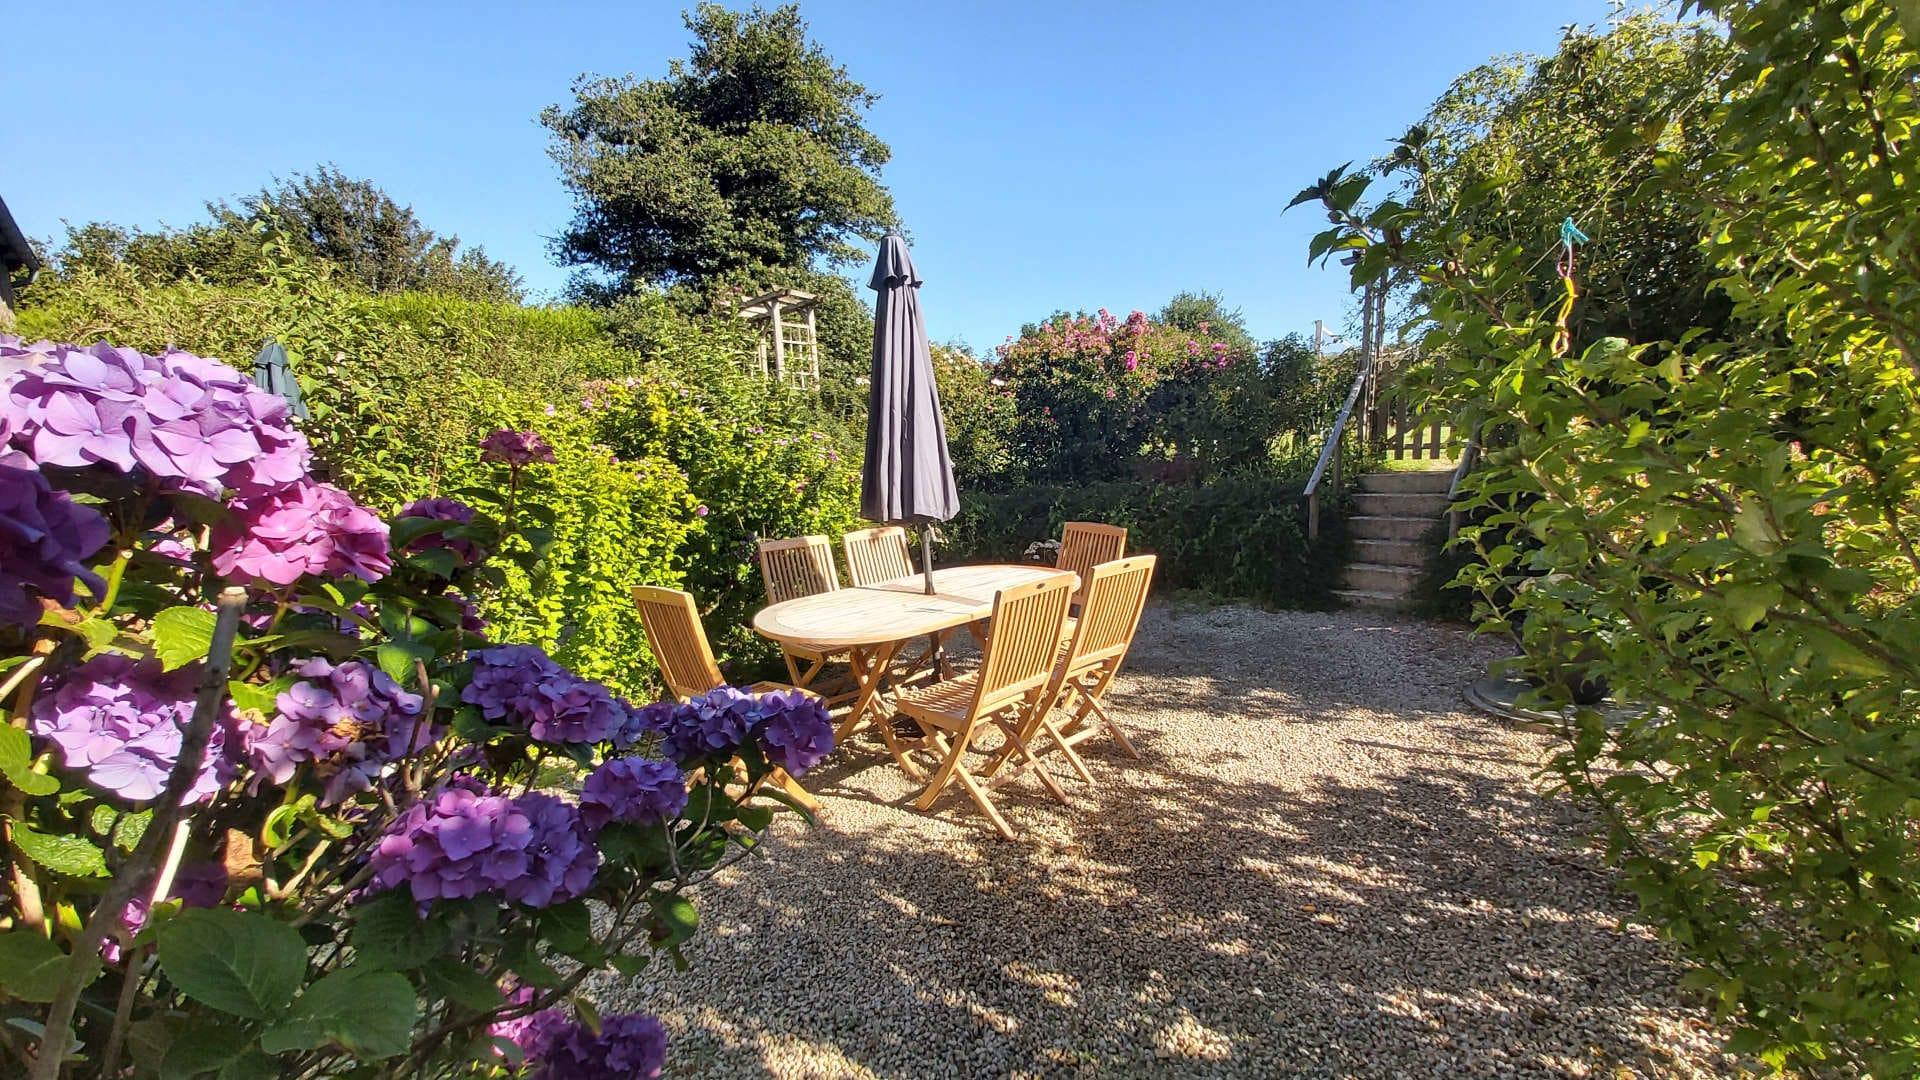 Domaine La Tarais, jardin fleuri avec terrasse près de Dinan